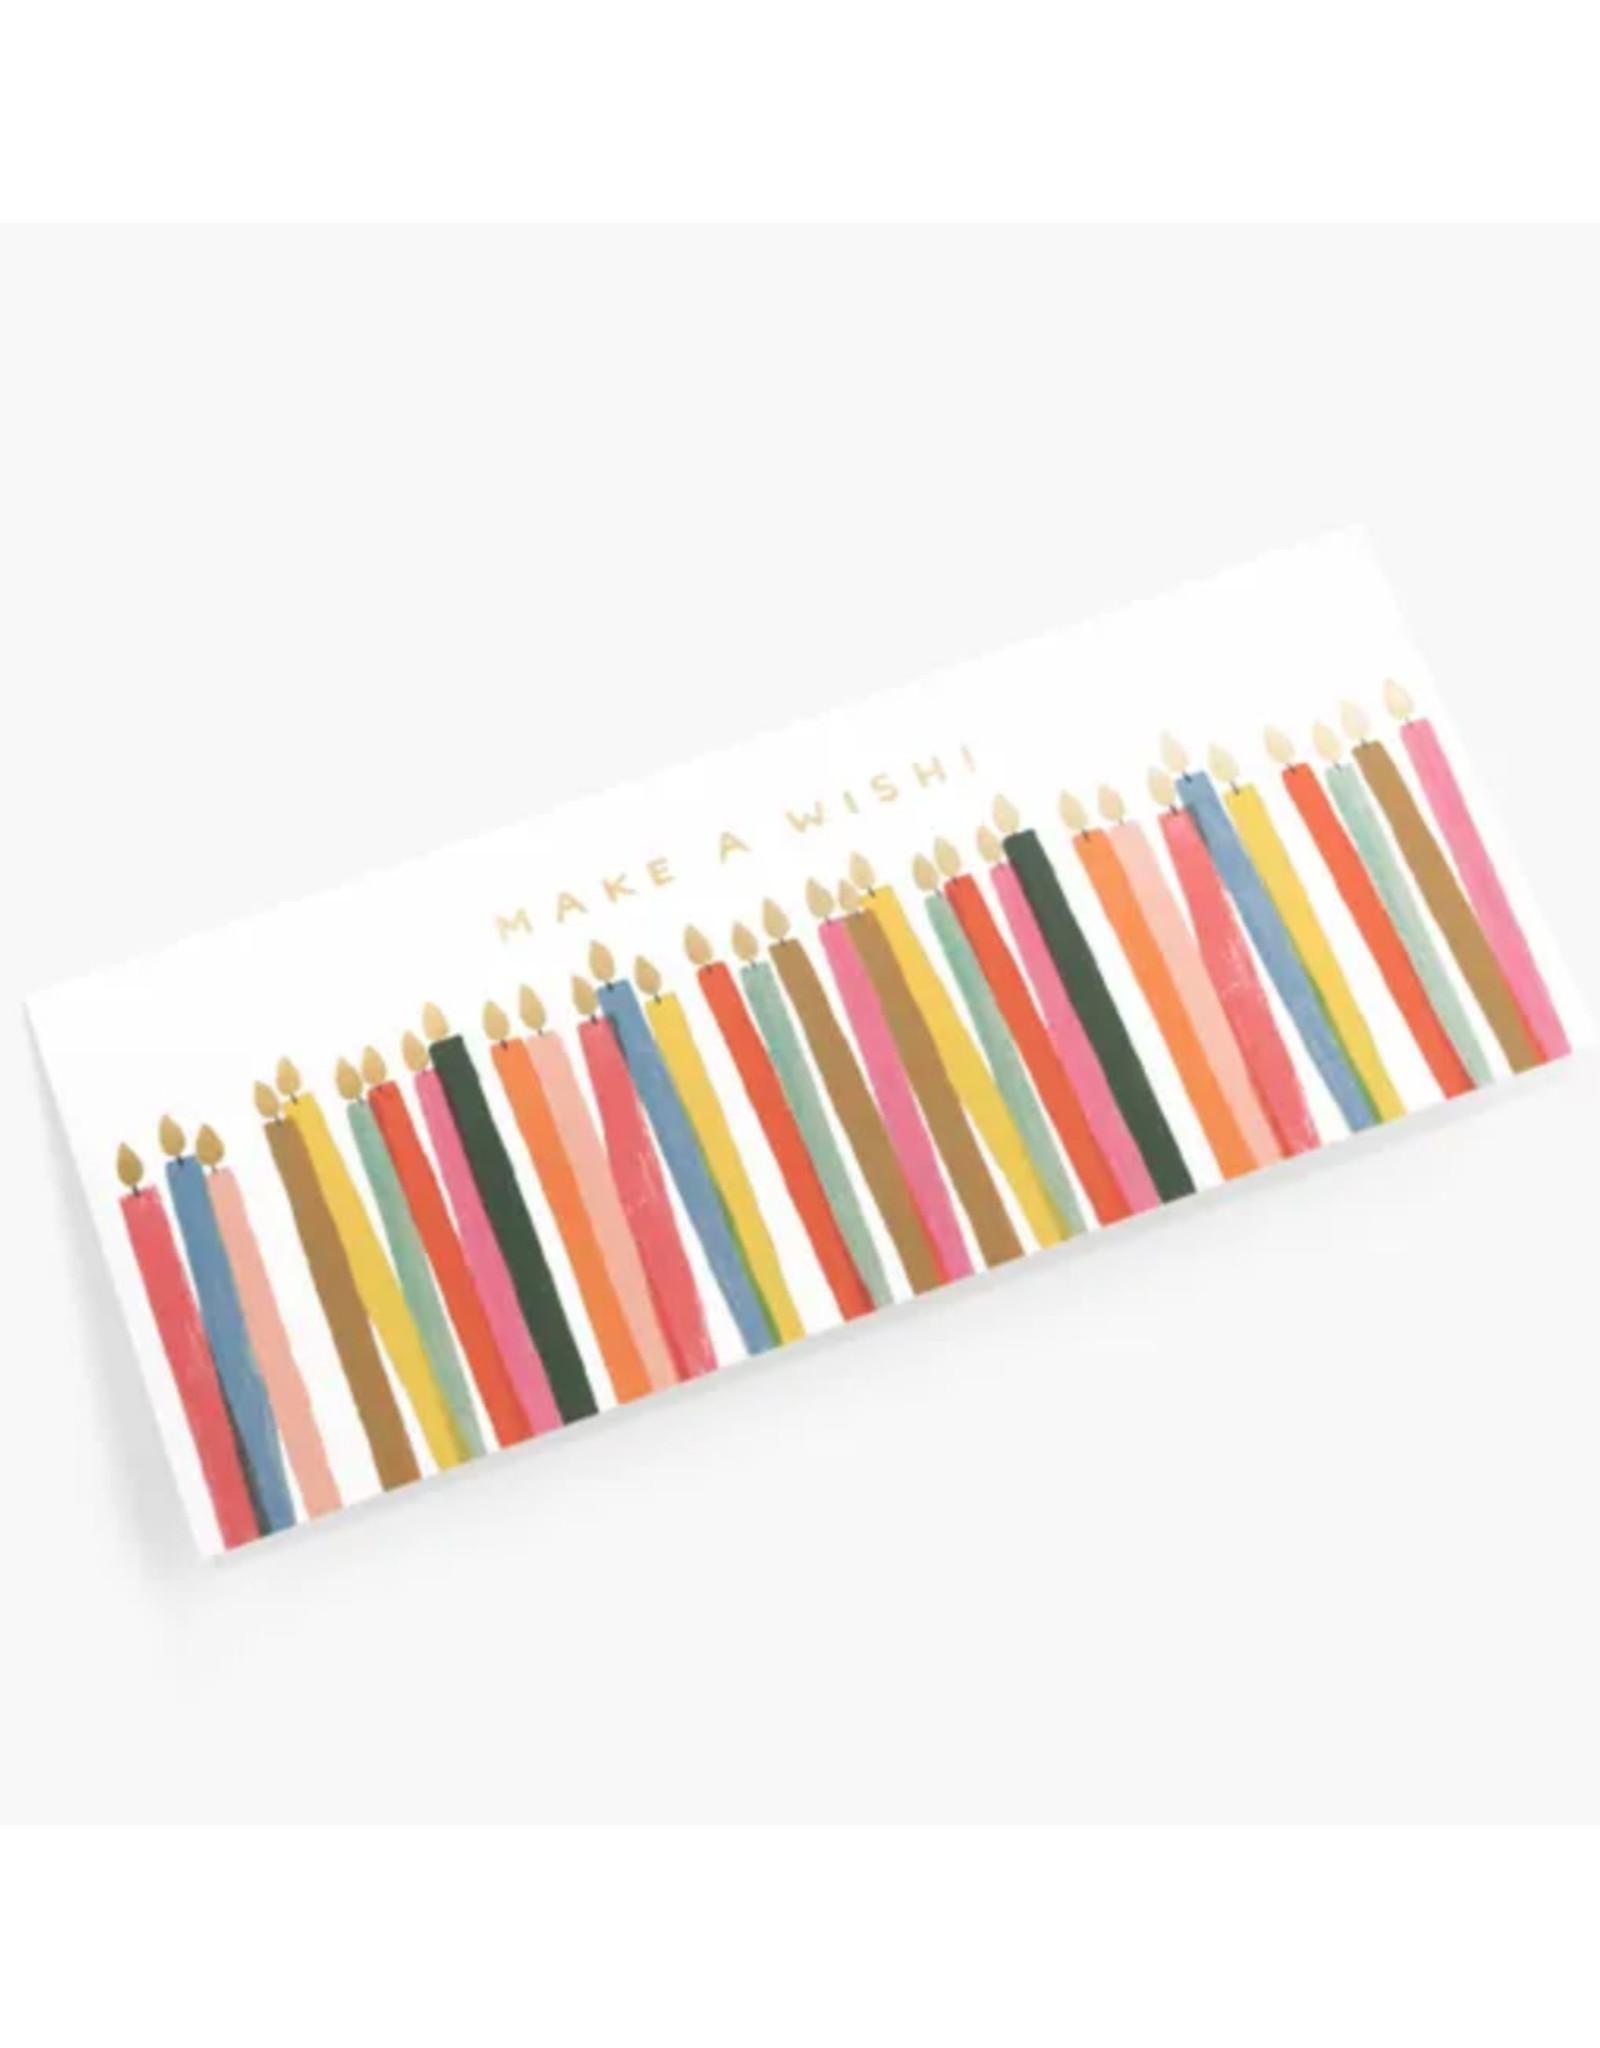 Rifle Paper Co. Make a Wish Candles No.10 Notecard